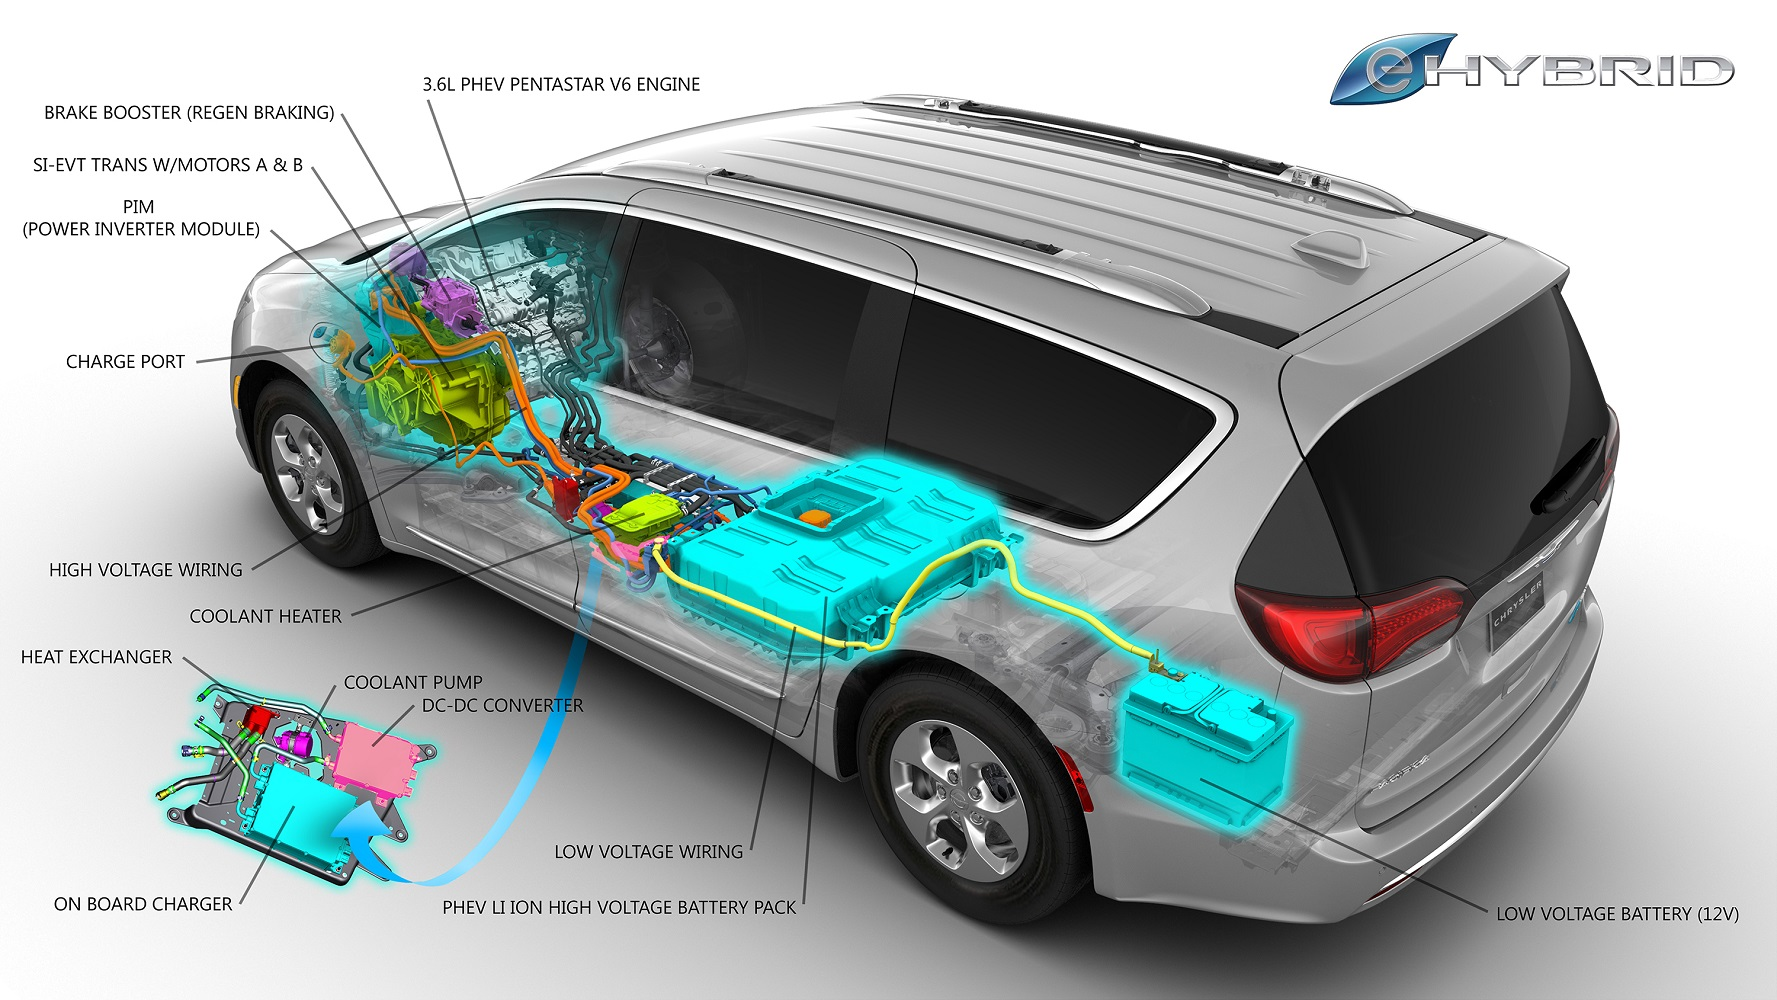 Chrysler Pacifica hybrid system